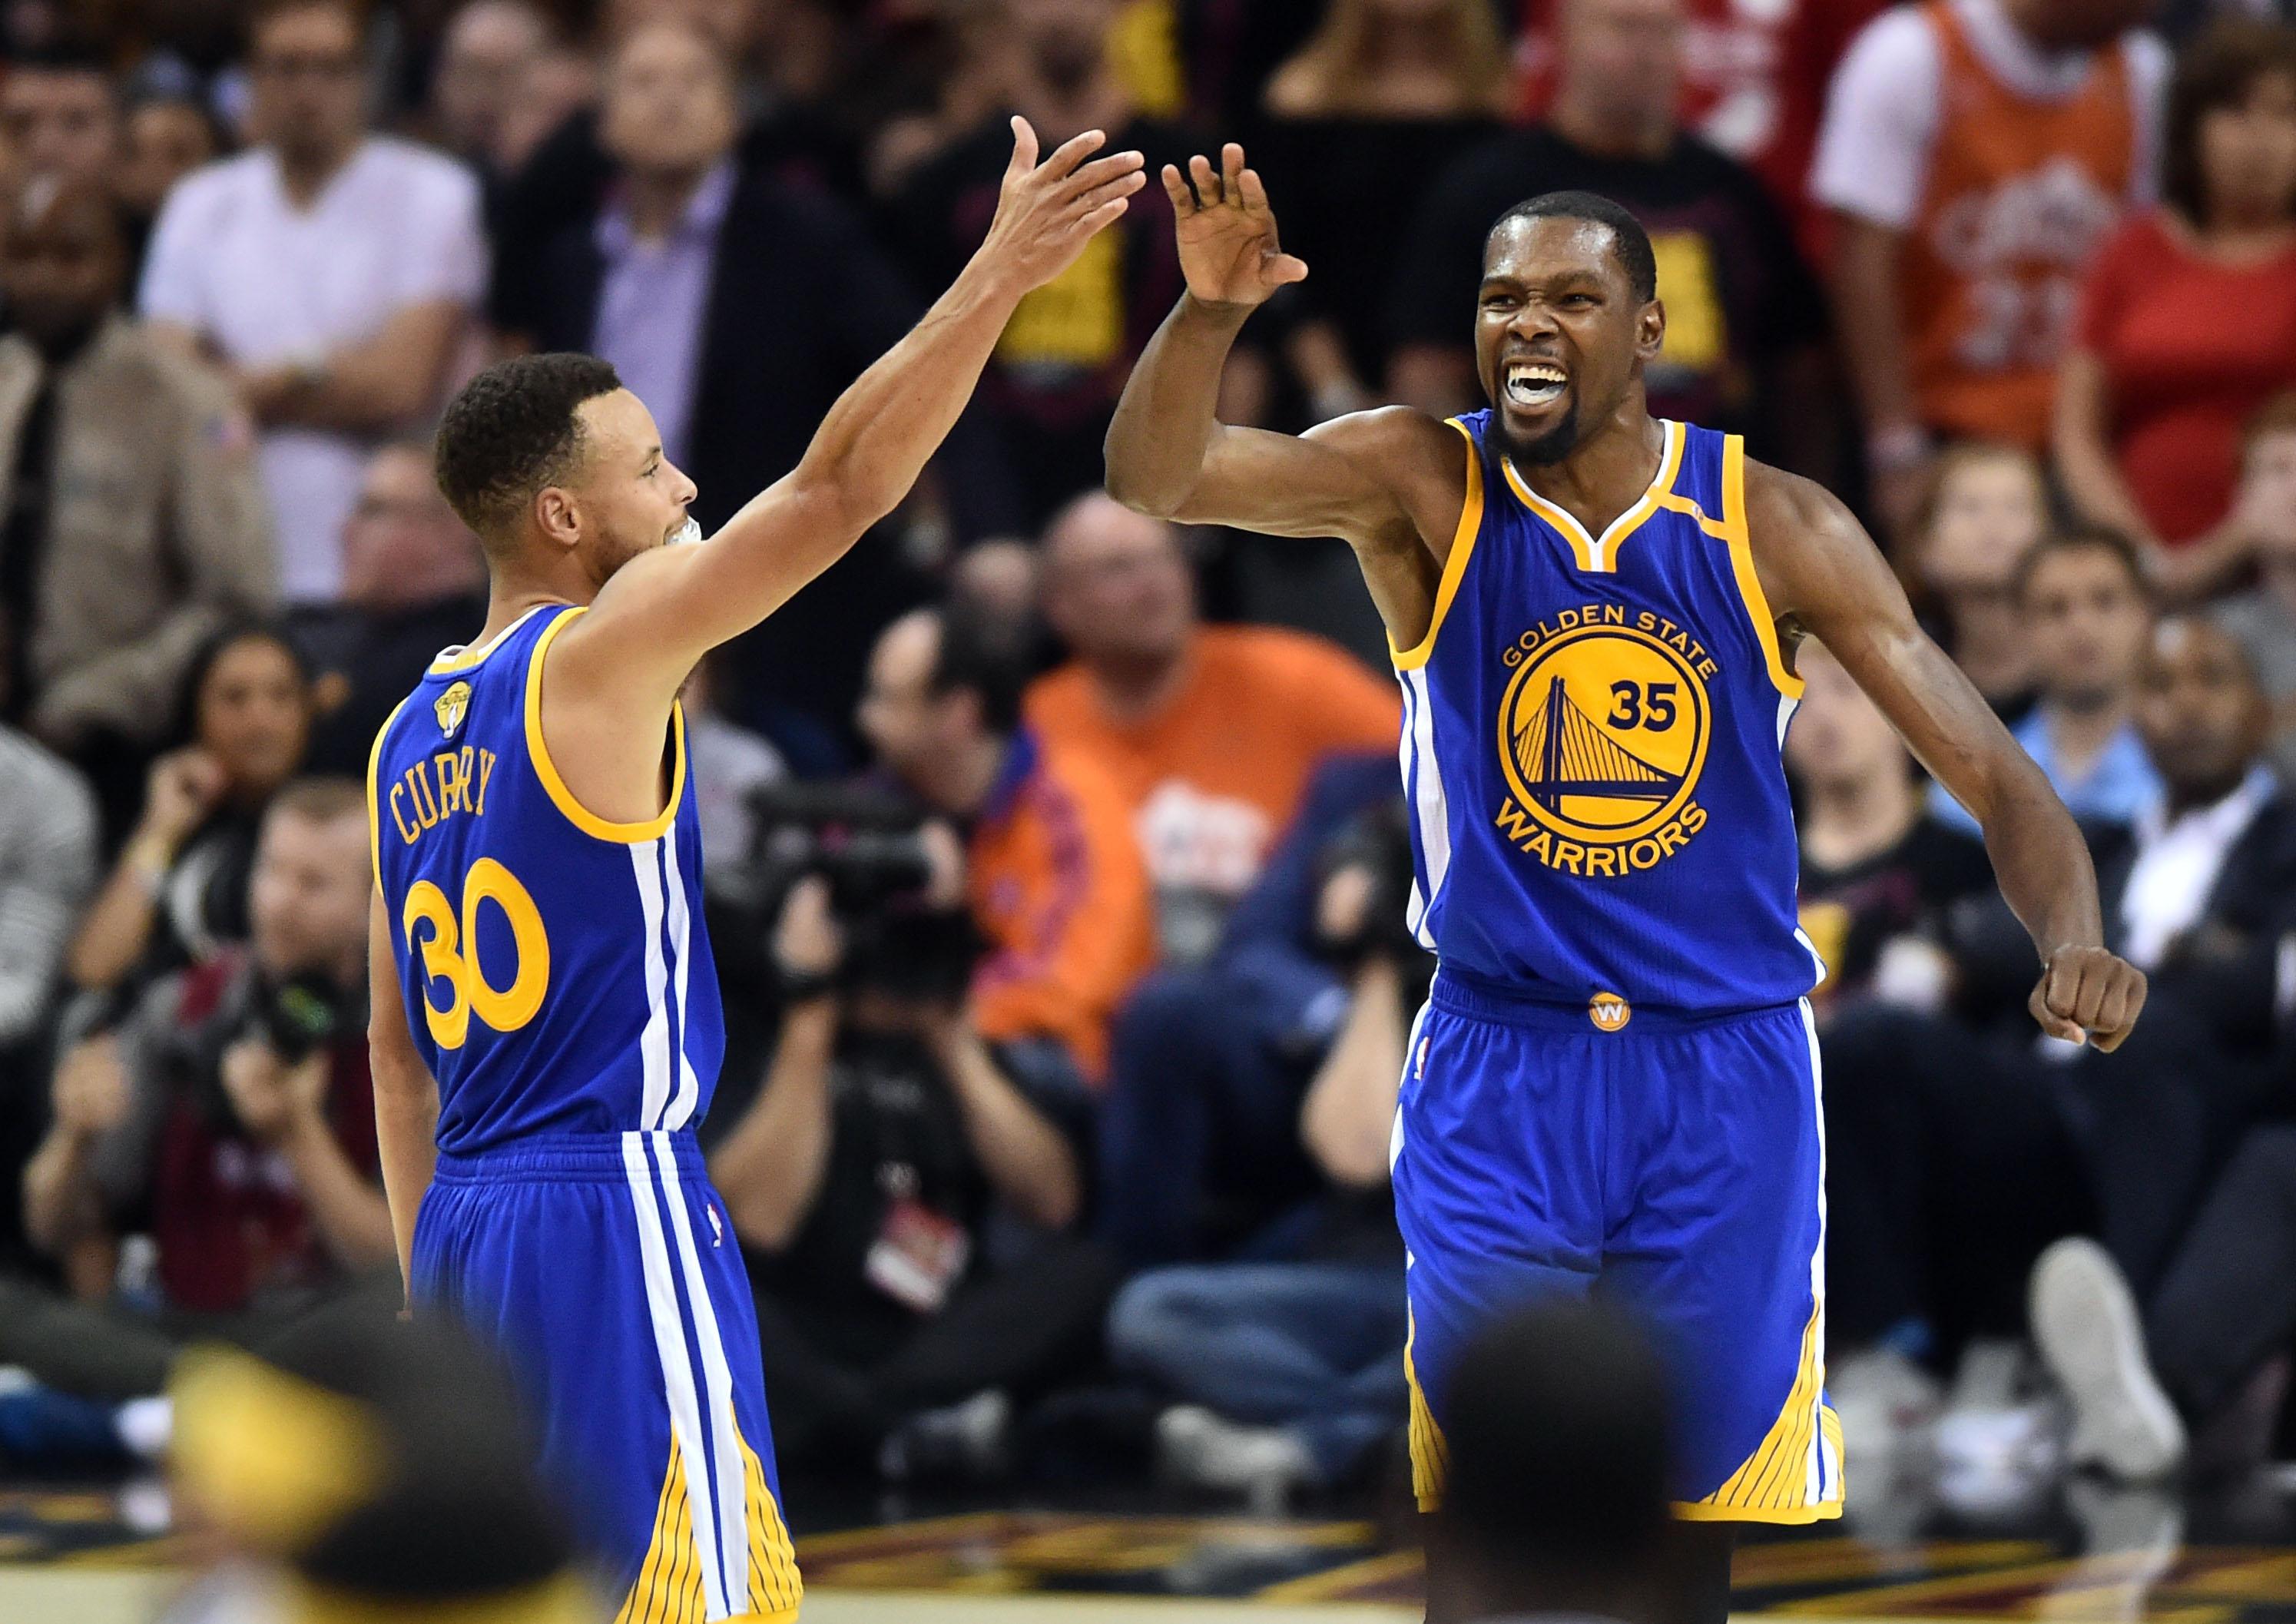 Miami heat lebron jamess vs golden state warriors nba2k17 miami - Nba Finals Golden State Warriors At Cleveland Cavaliers